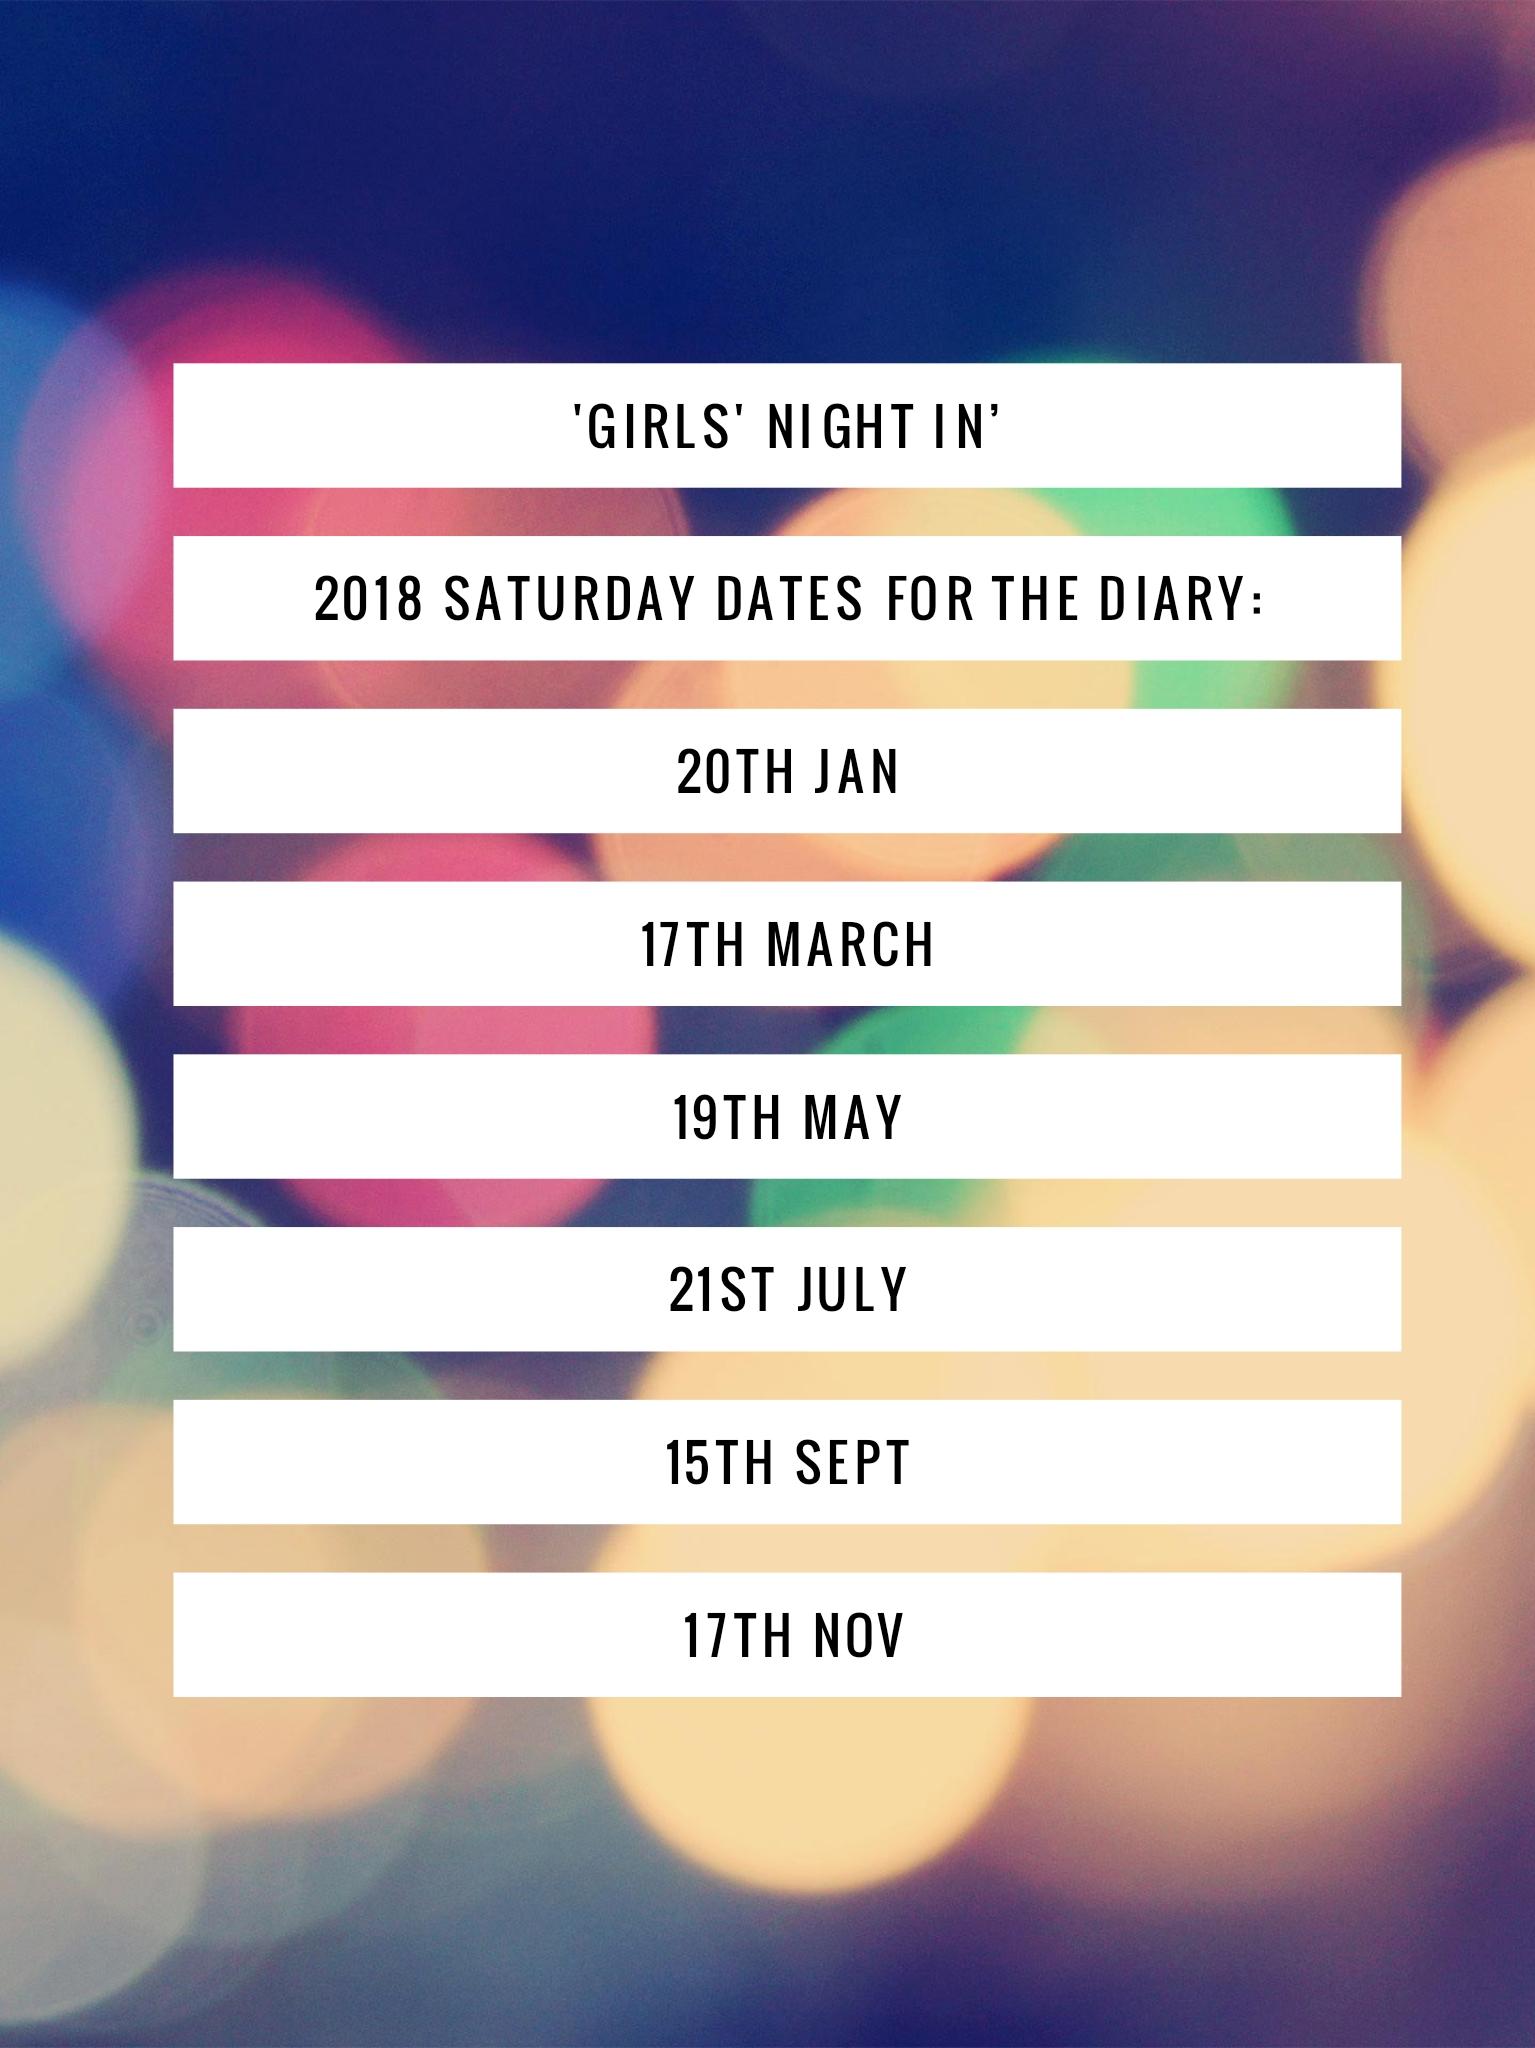 Girls' Night In Dates